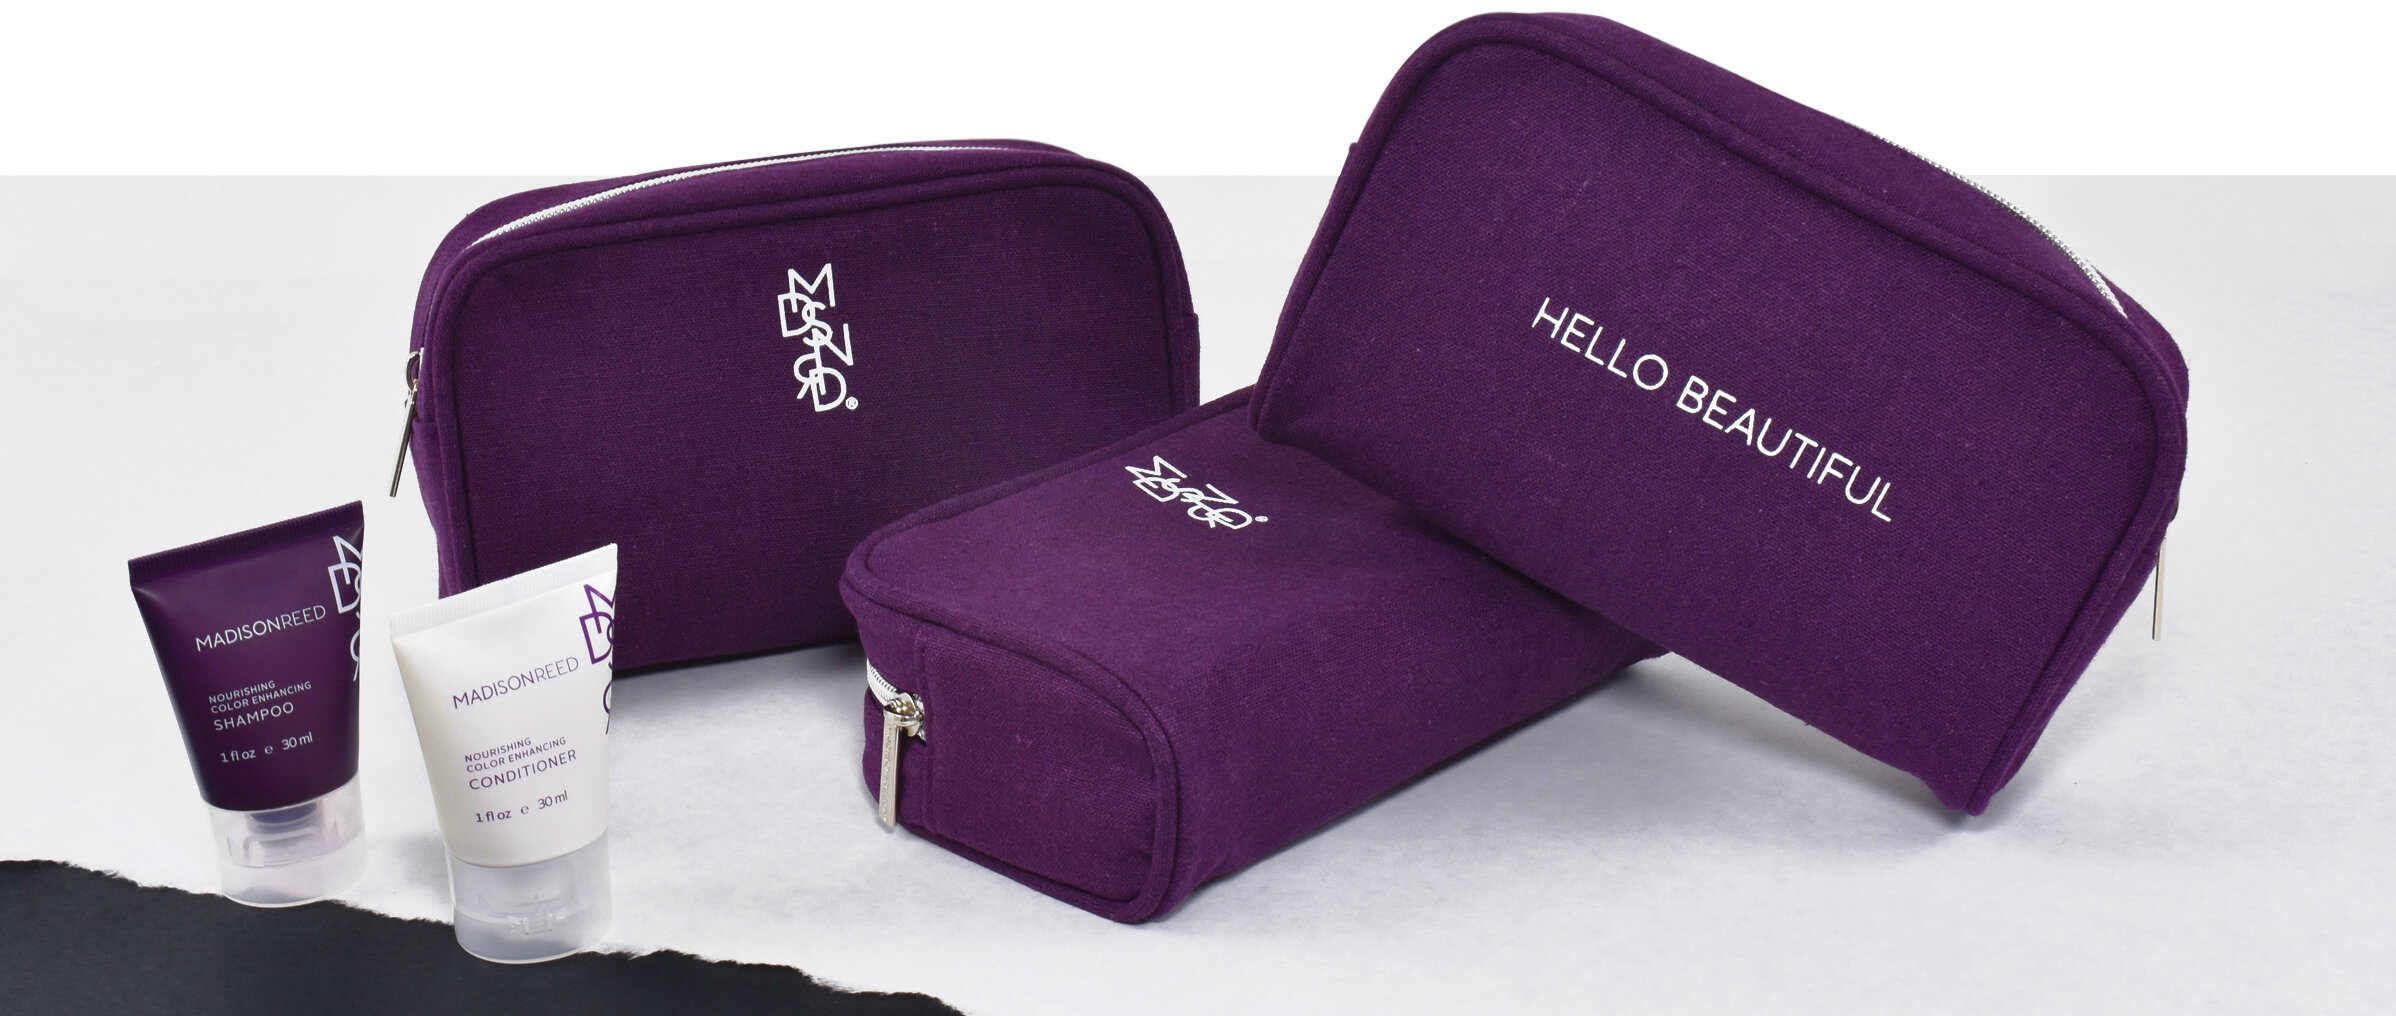 Madison-Reed-Cosmetic-Bag_02.jpeg